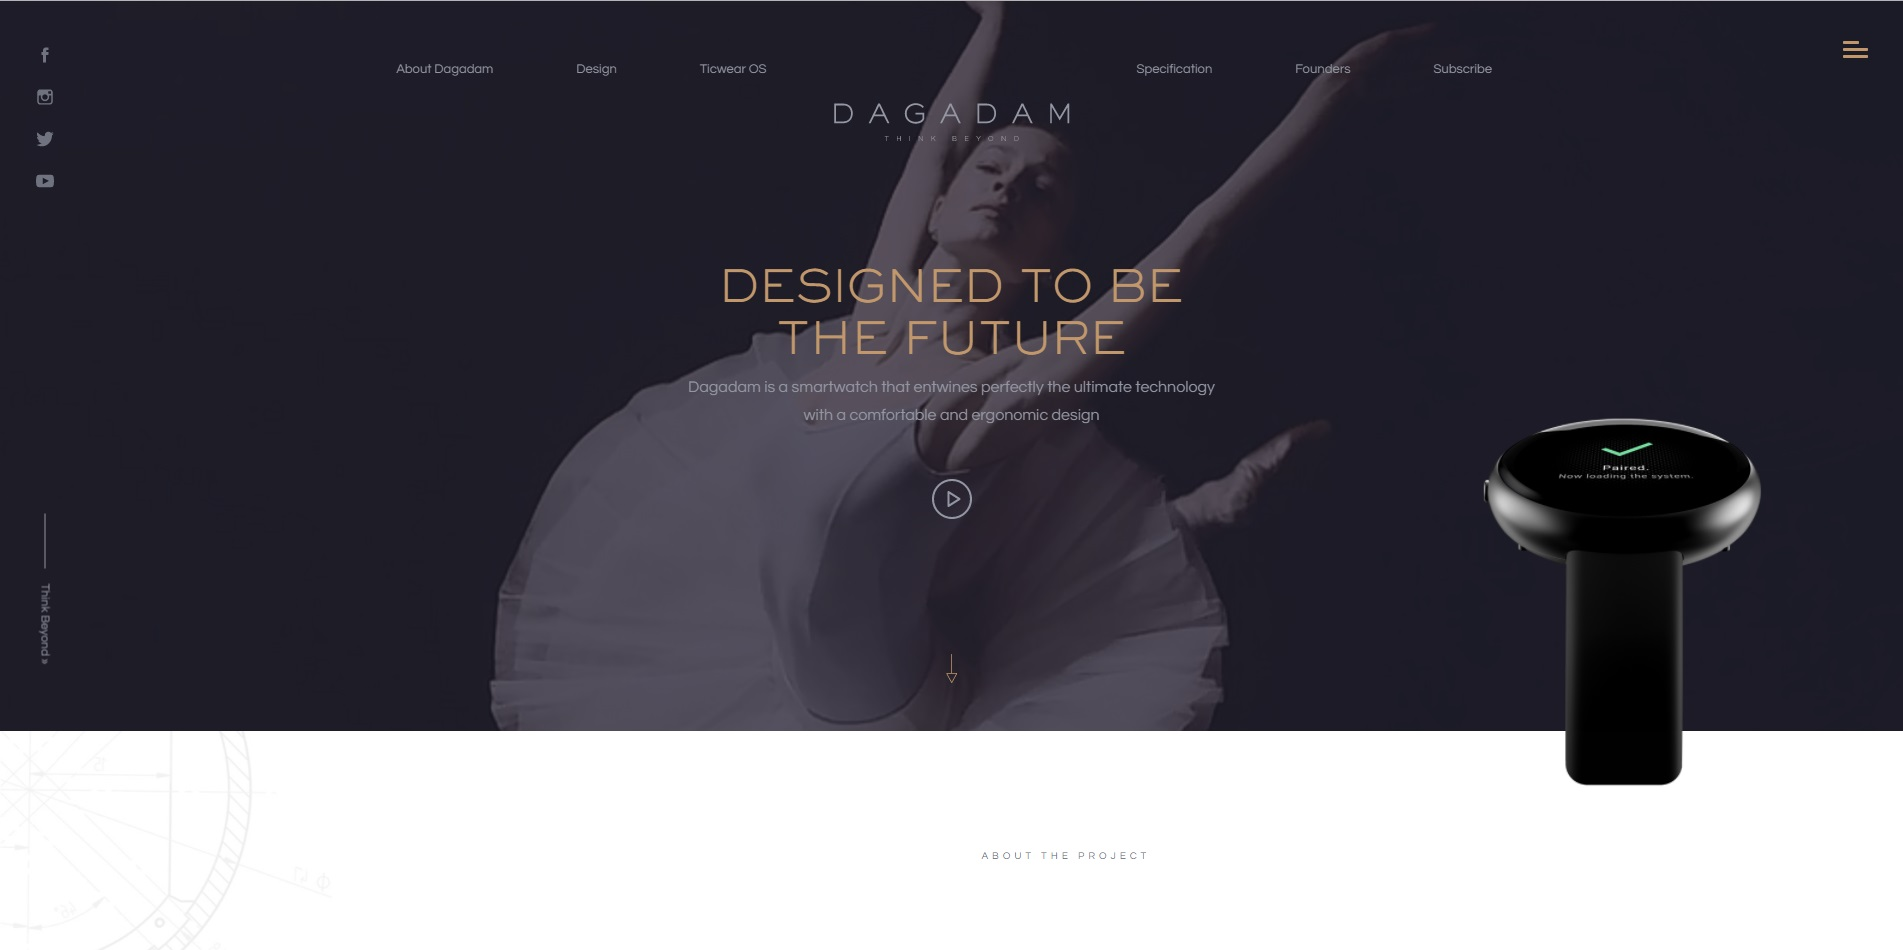 trendy web design 2018 - filmy i animacje